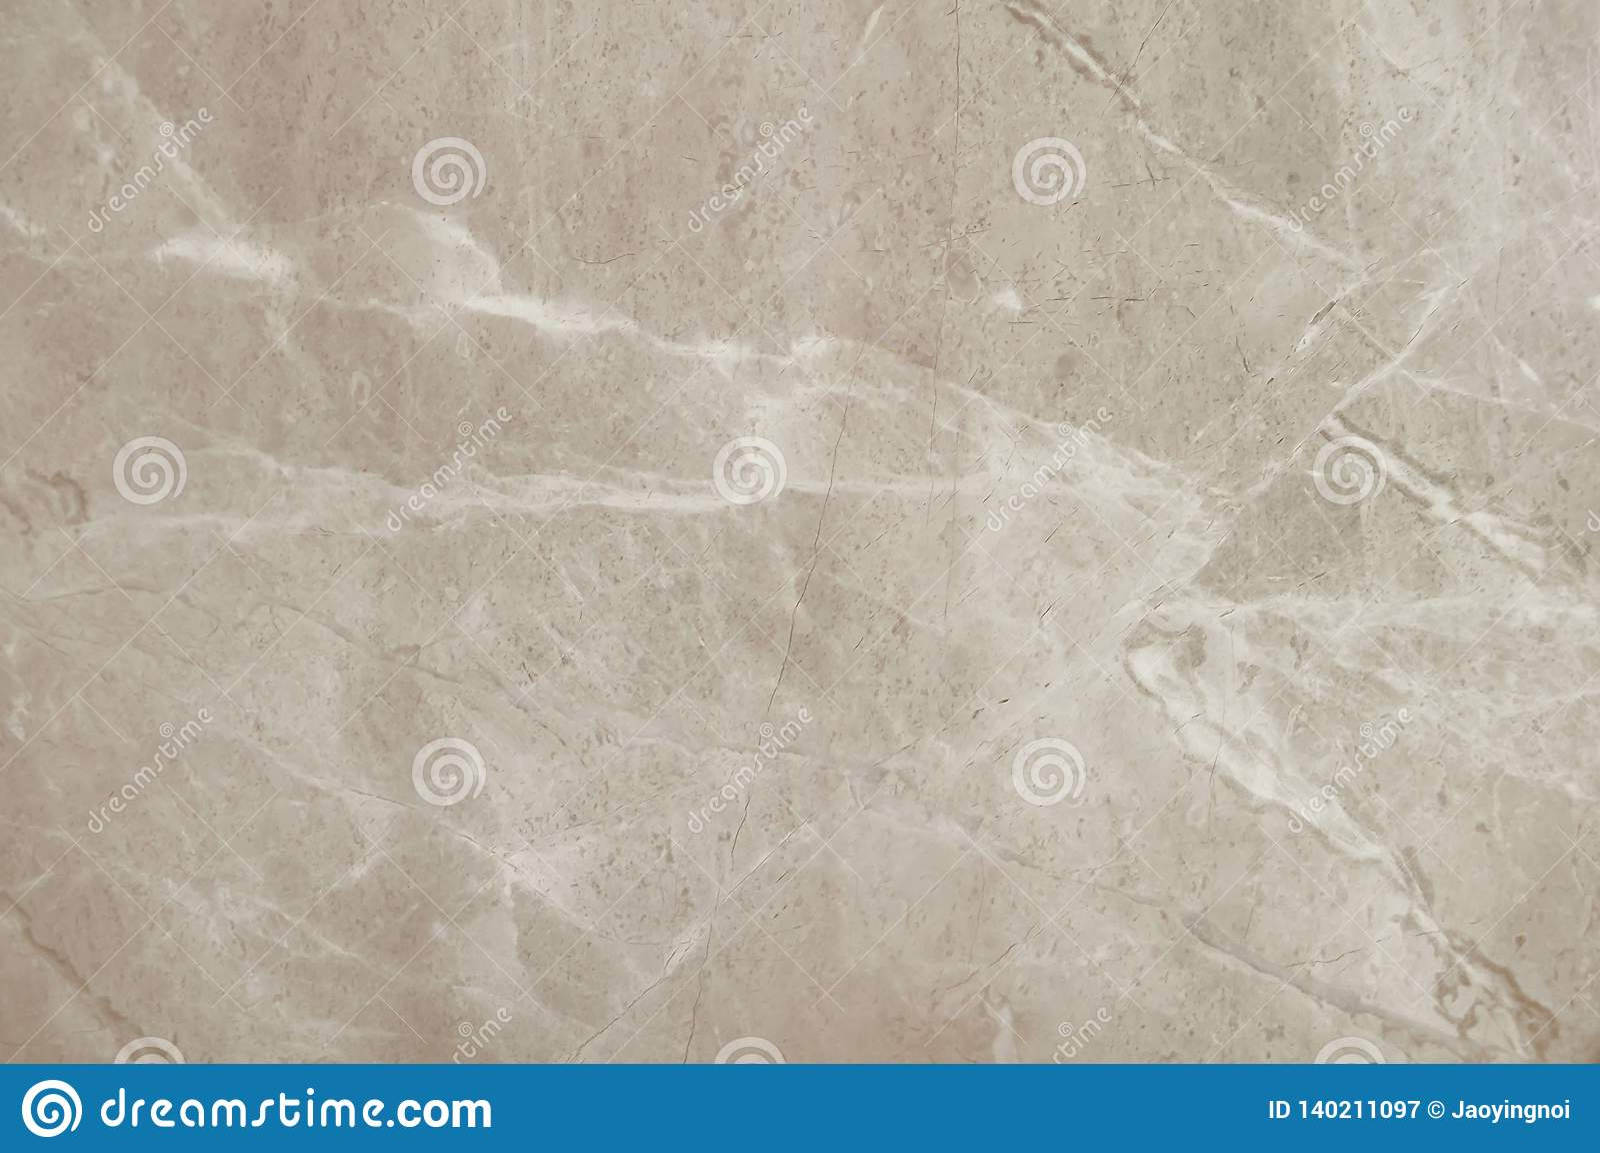 Браун или бежевая мраморная каменная предпосылка Мрамор Брайна, фон текстуры кварца Картина стены и мрамора панели естественная д